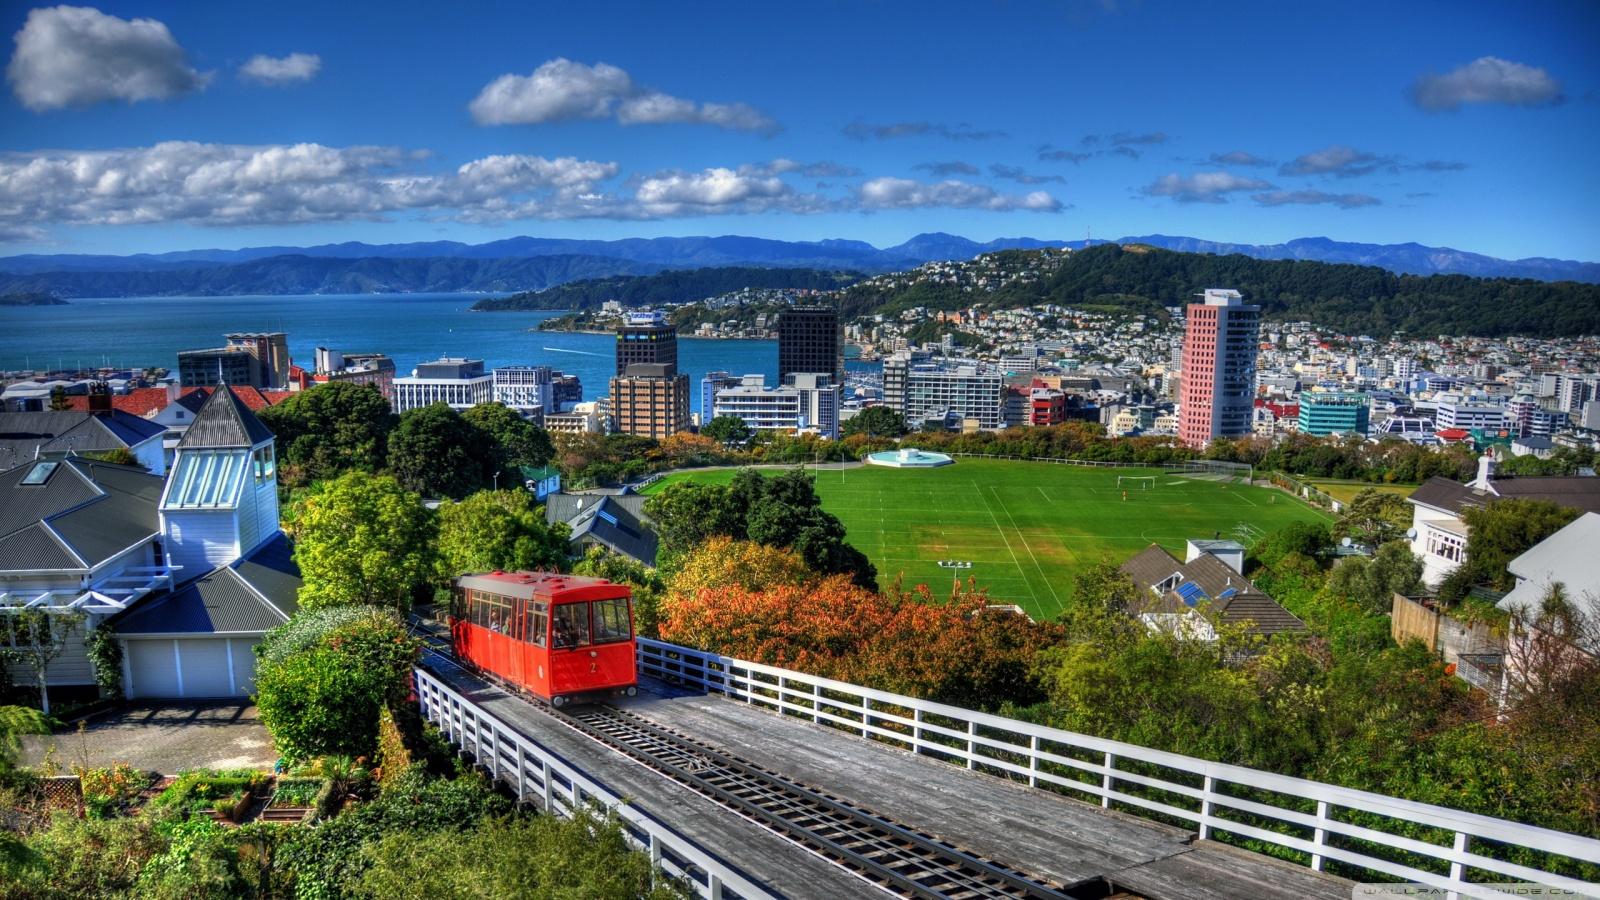 New Zealand Houses Wellington From Above 4K HD Desktop 1600x900